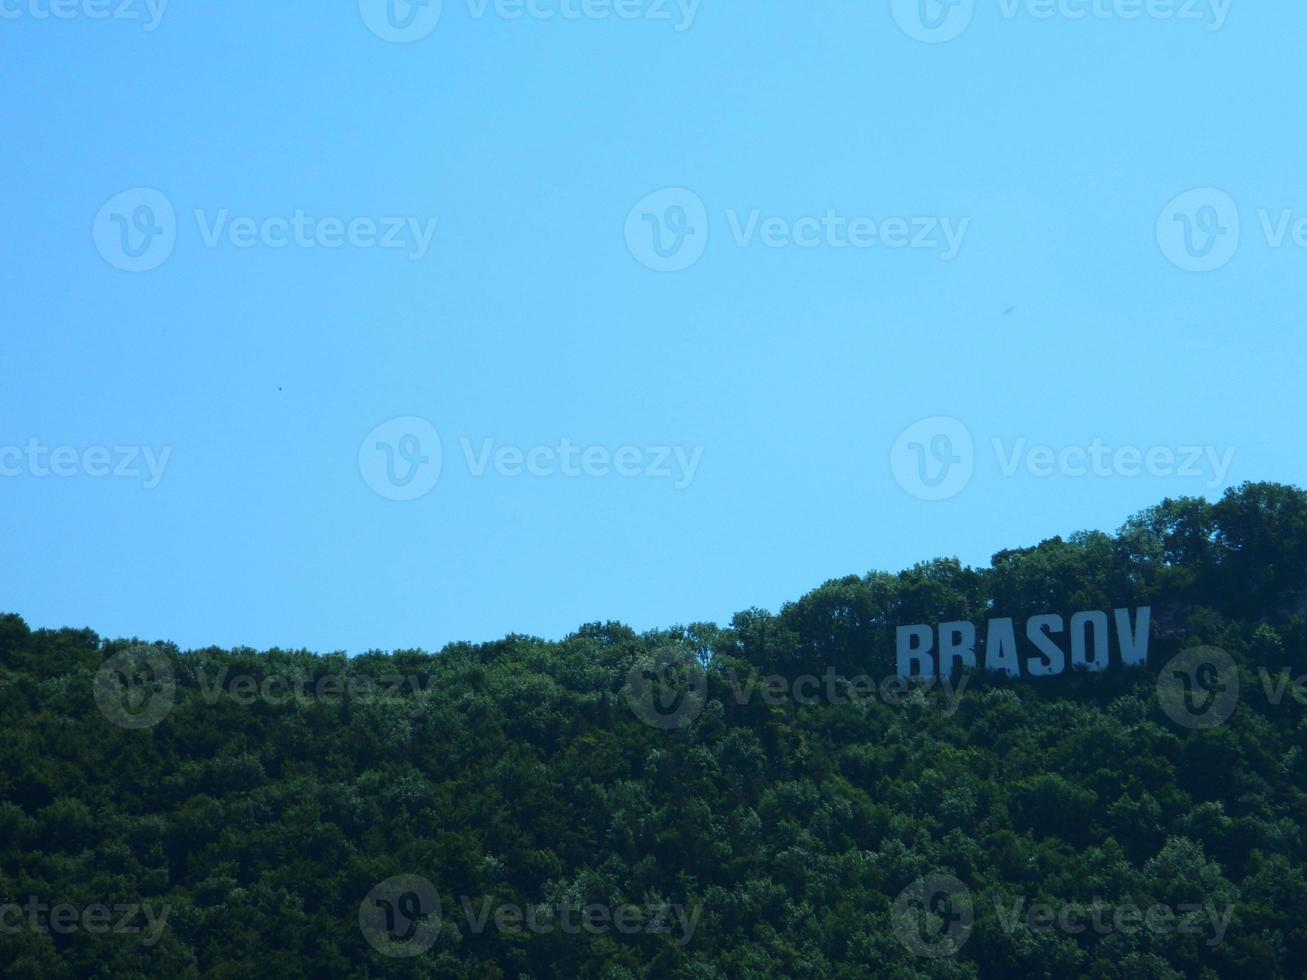 Brasov signe au sommet de la colline de Tampa. photo